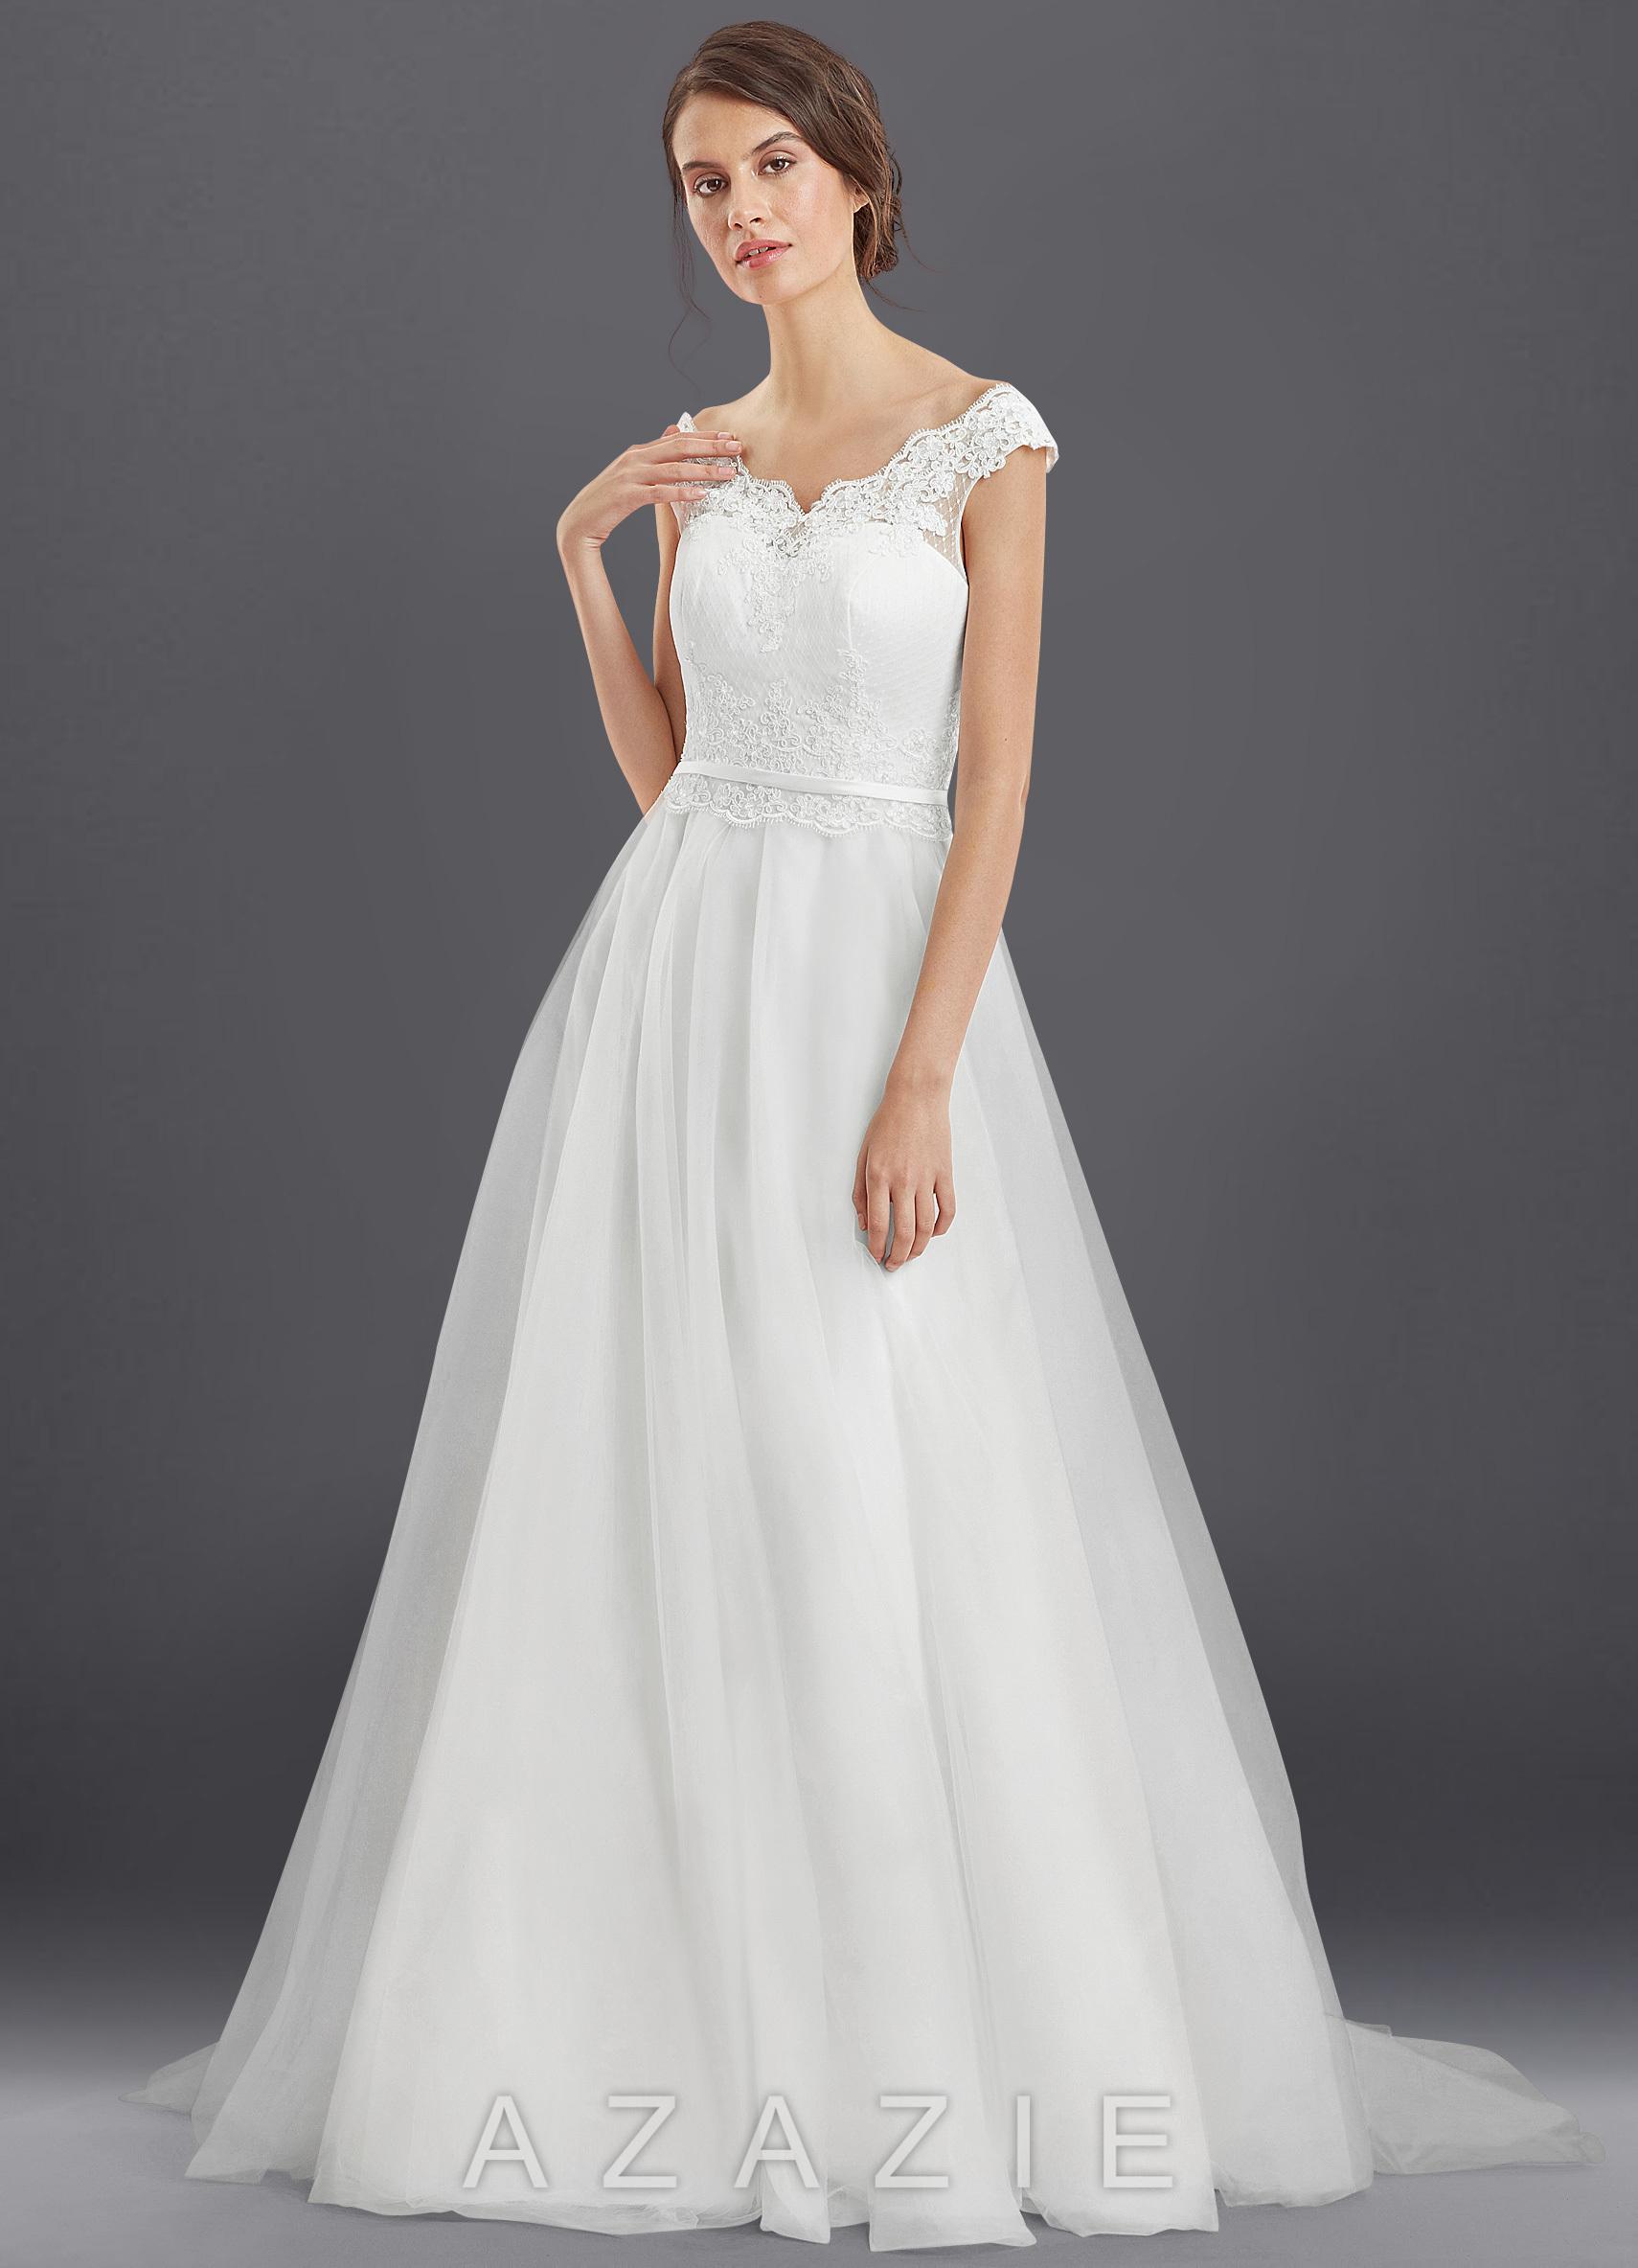 Wedding Dresses, Bridal Gowns, Wedding Gowns   Azazie